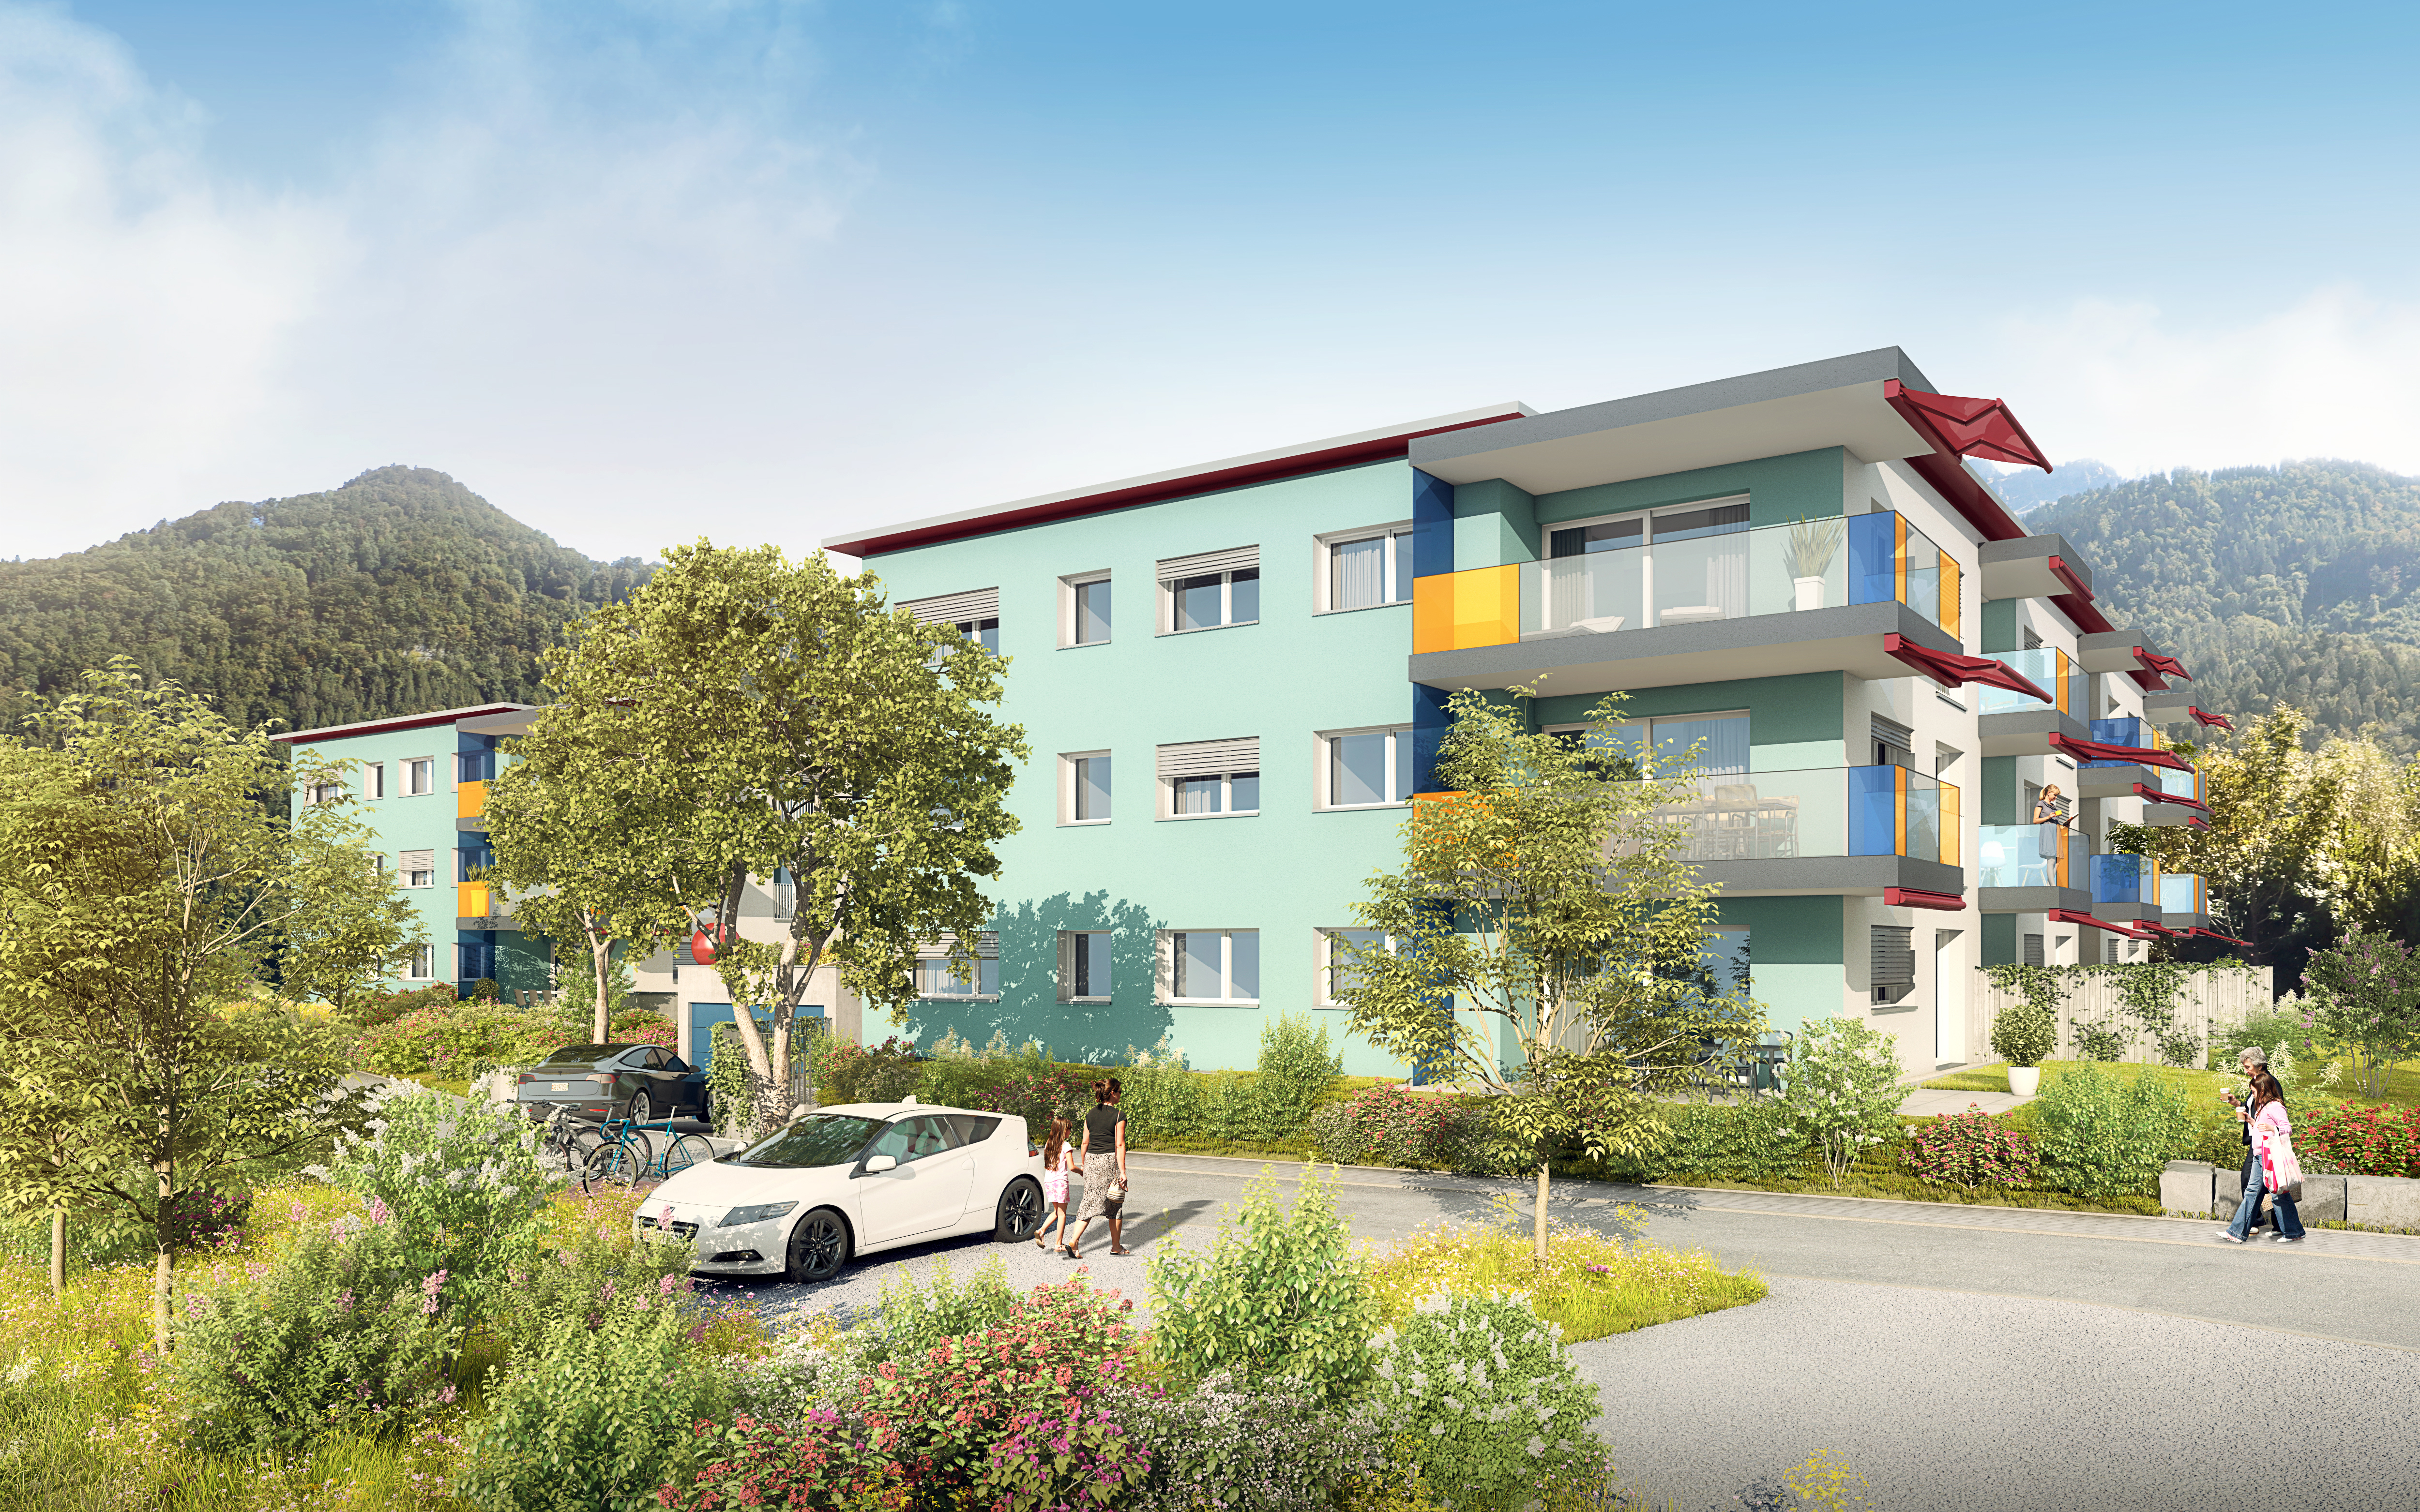 Rüteli Mollis Wohnüberbauung